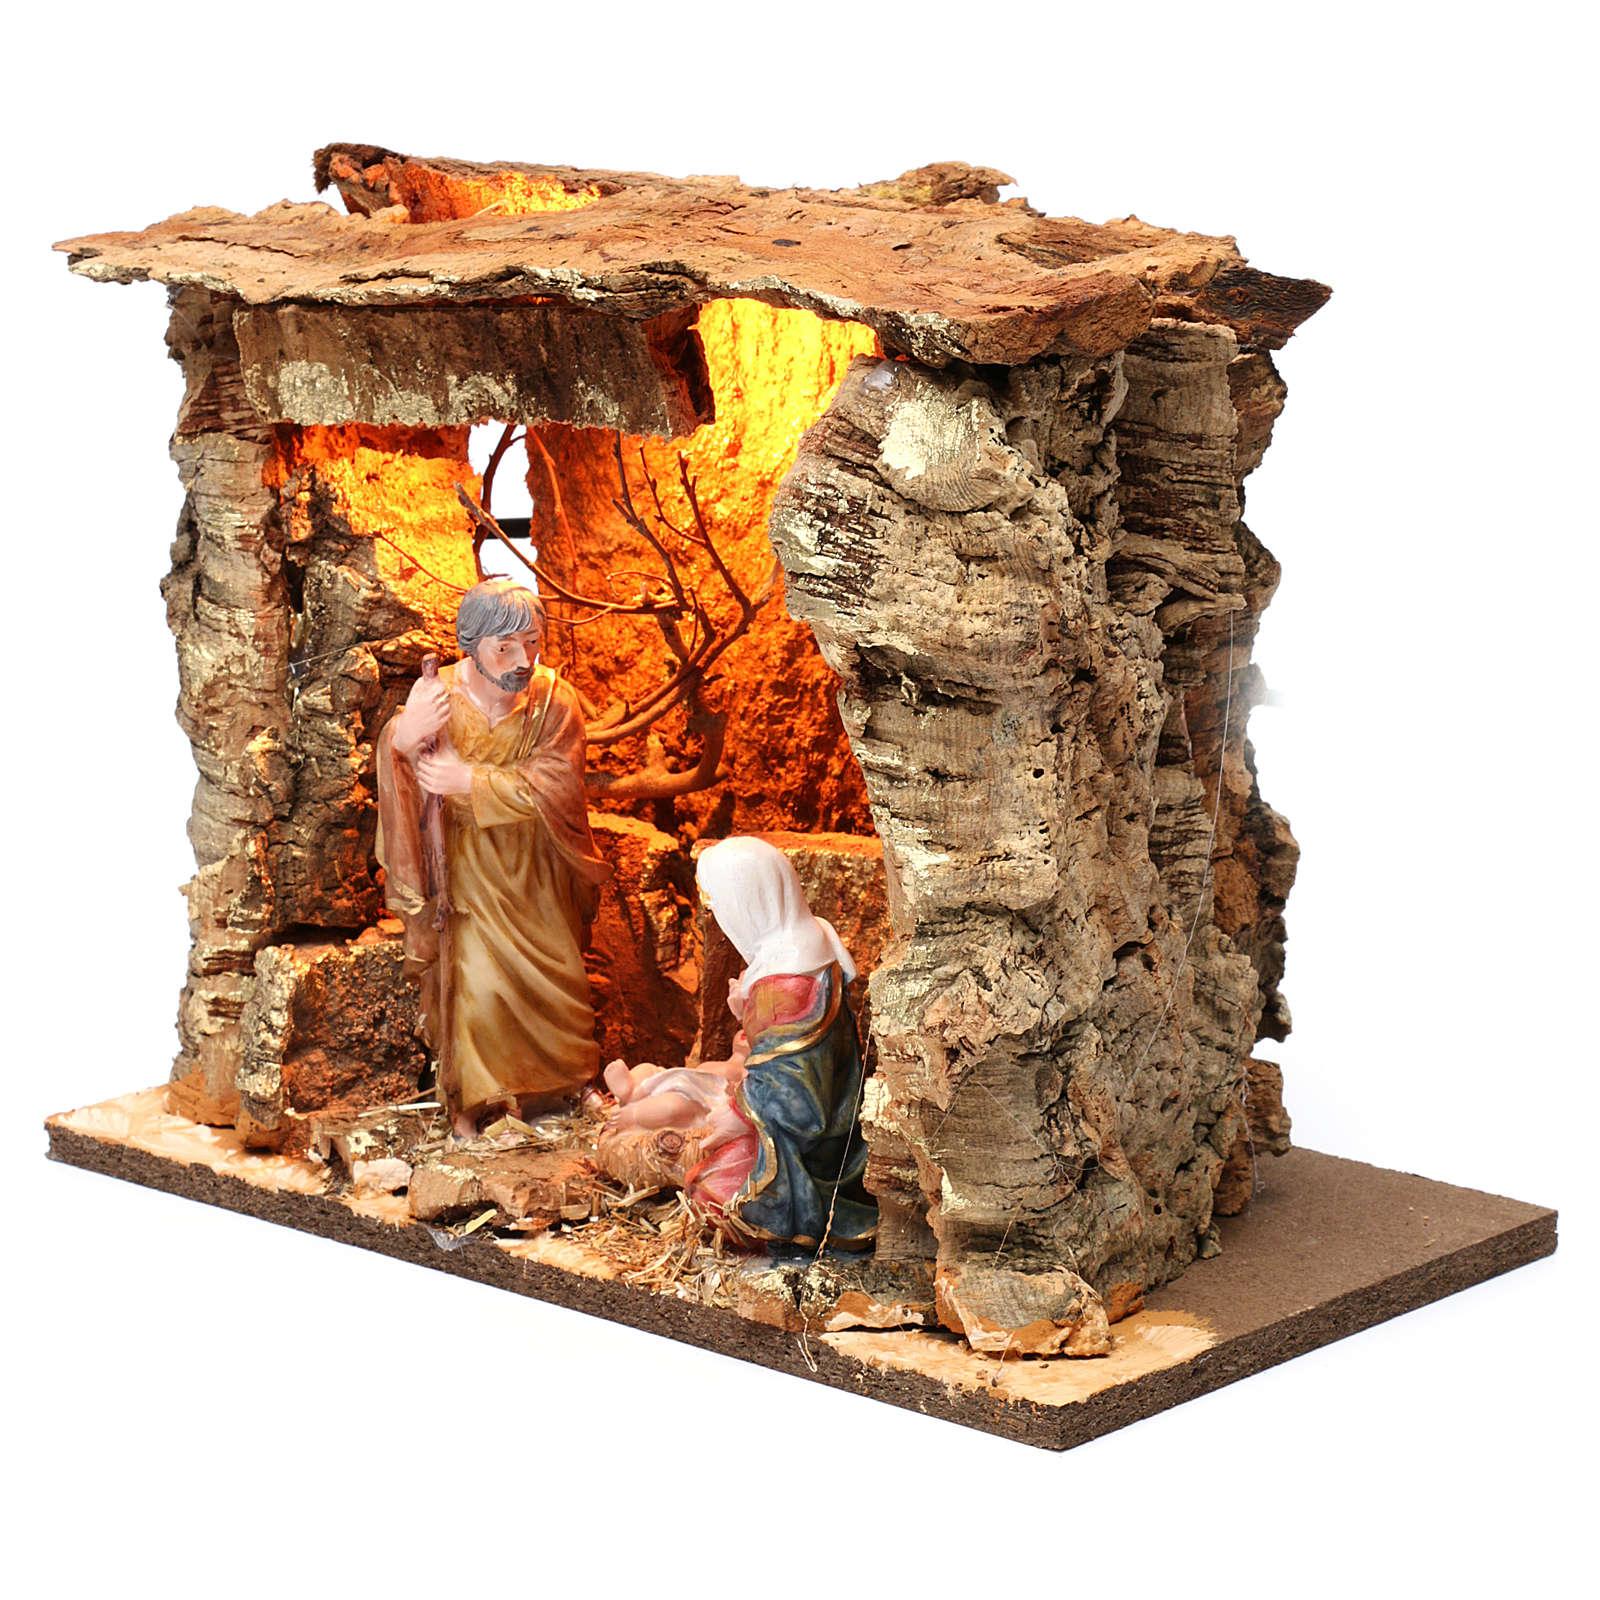 Portal Belén de Navidad con Sagrada Família, medidas 22 x 33 x 18 cm, diferentres modelos 4